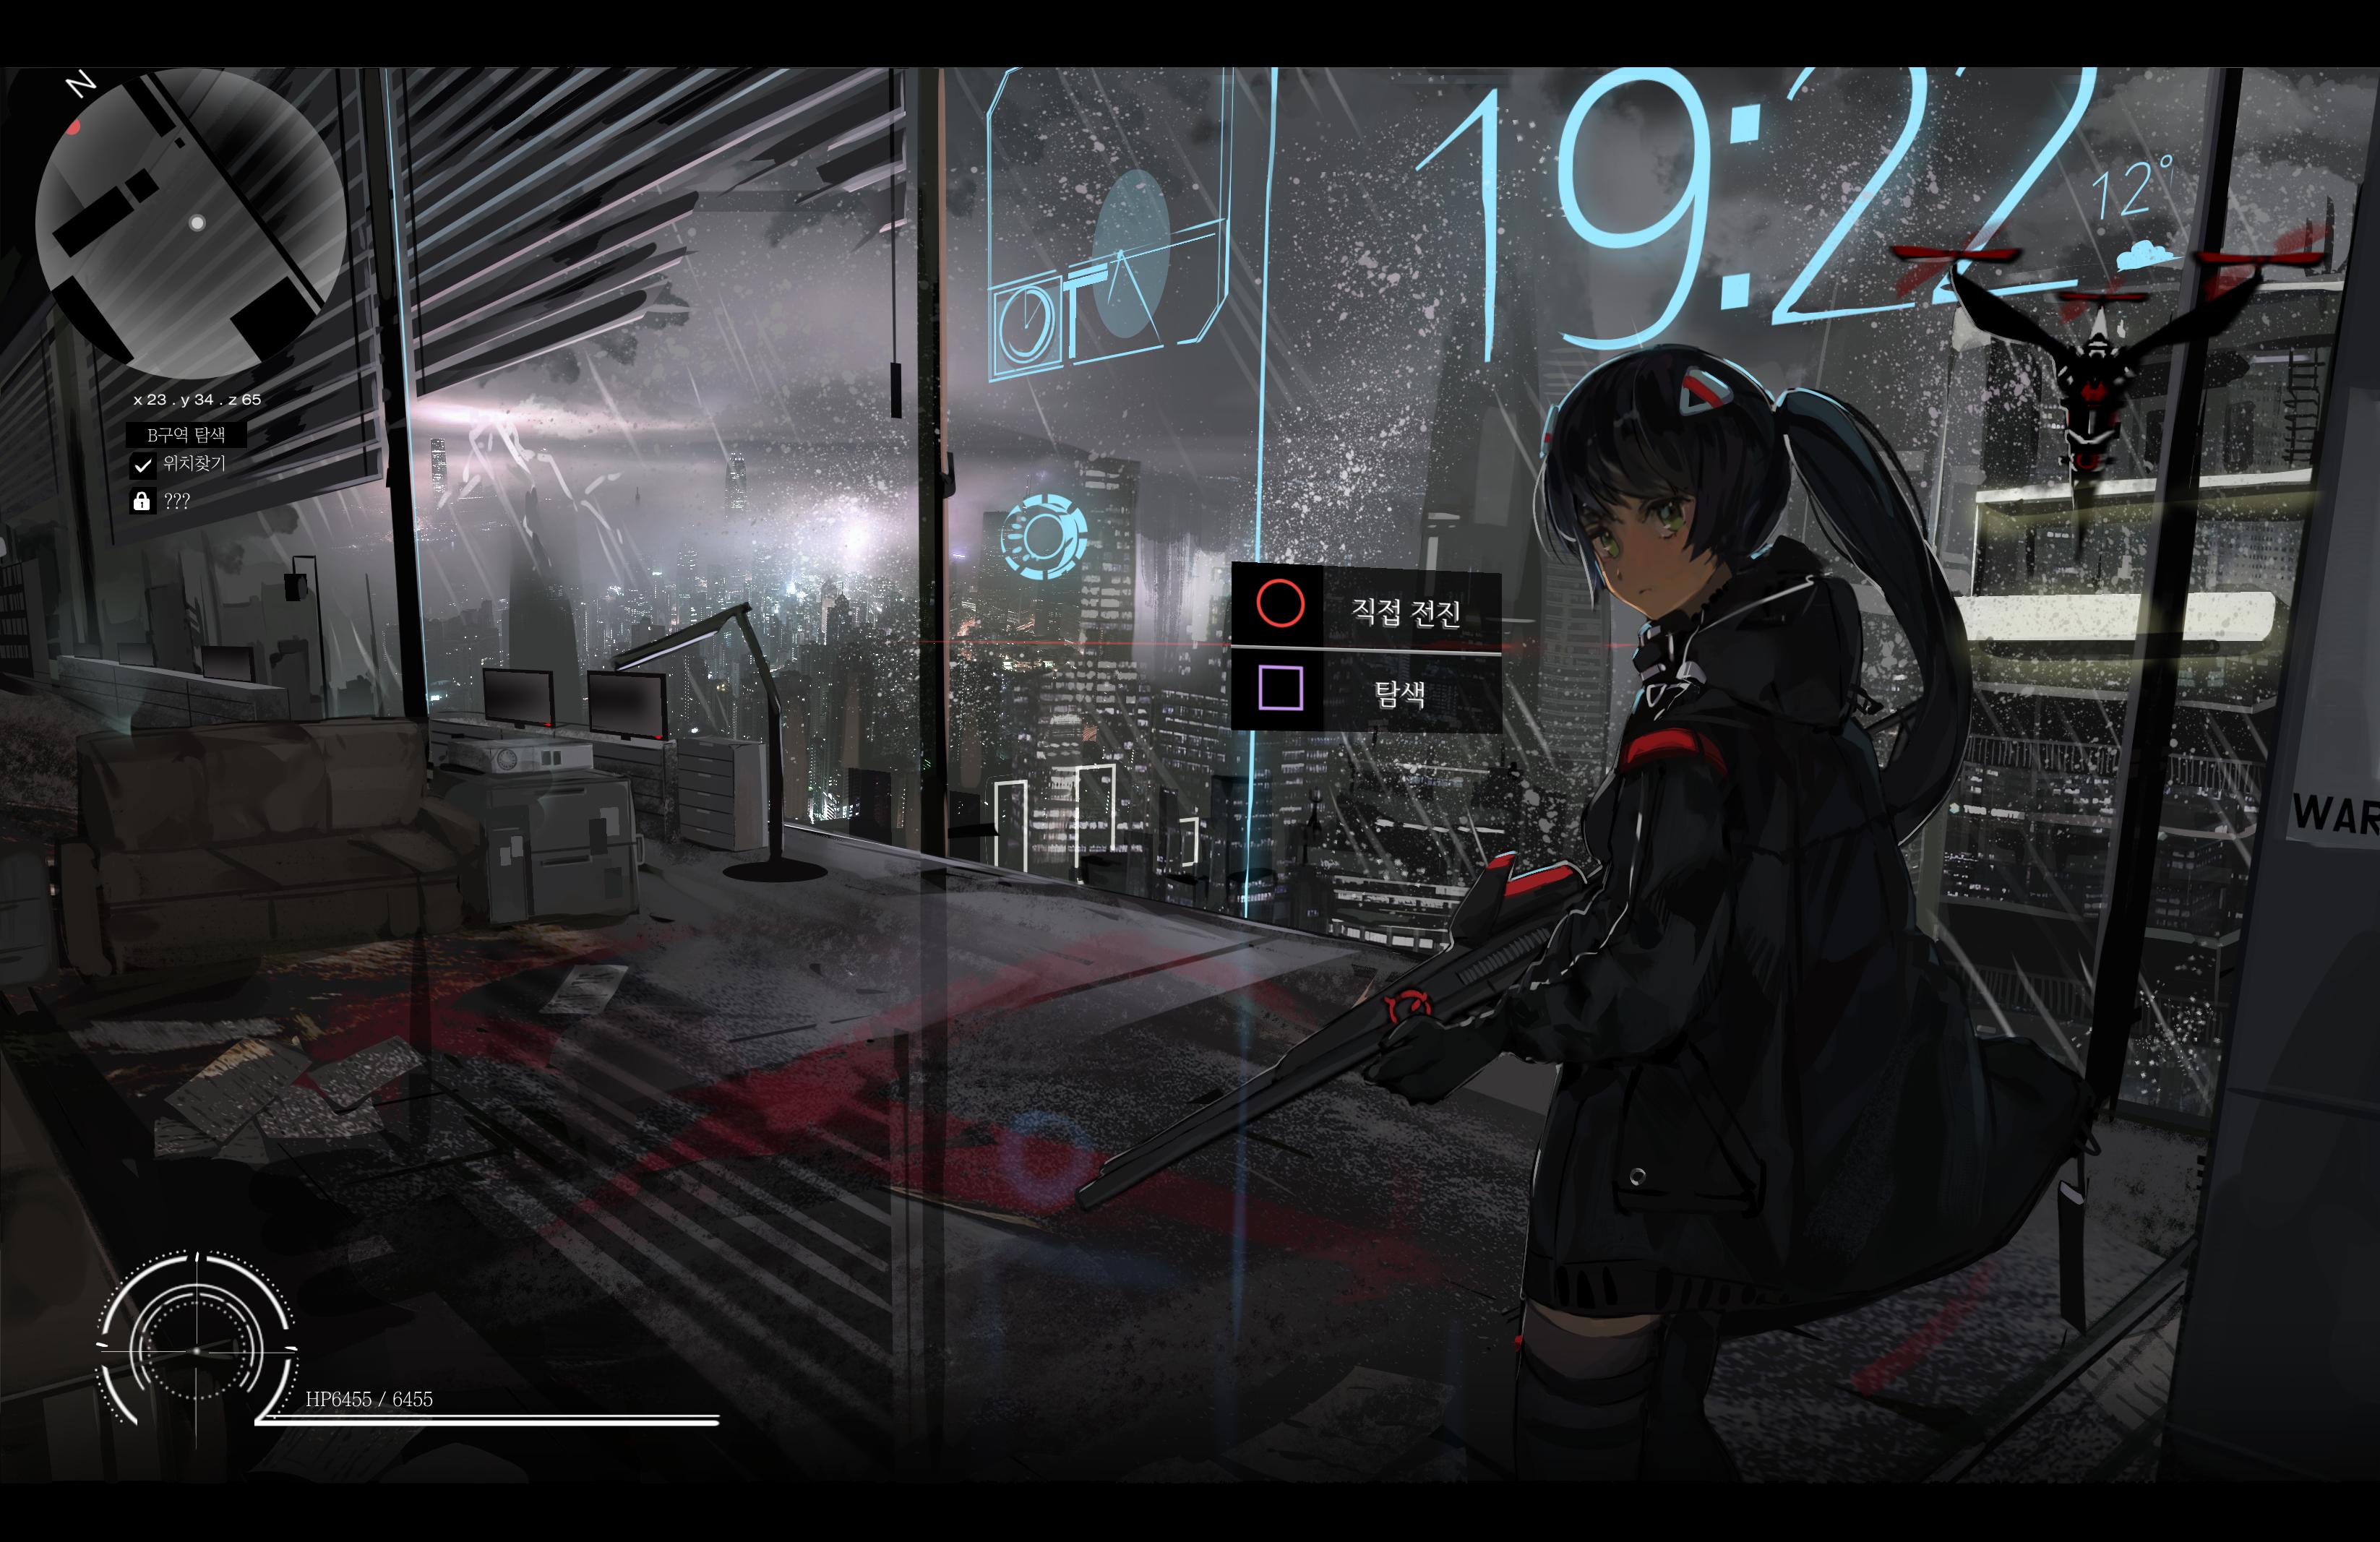 Anime 3293x2134 anime anime girls weapon Korean drone city rain night shotgun numbers futuristic